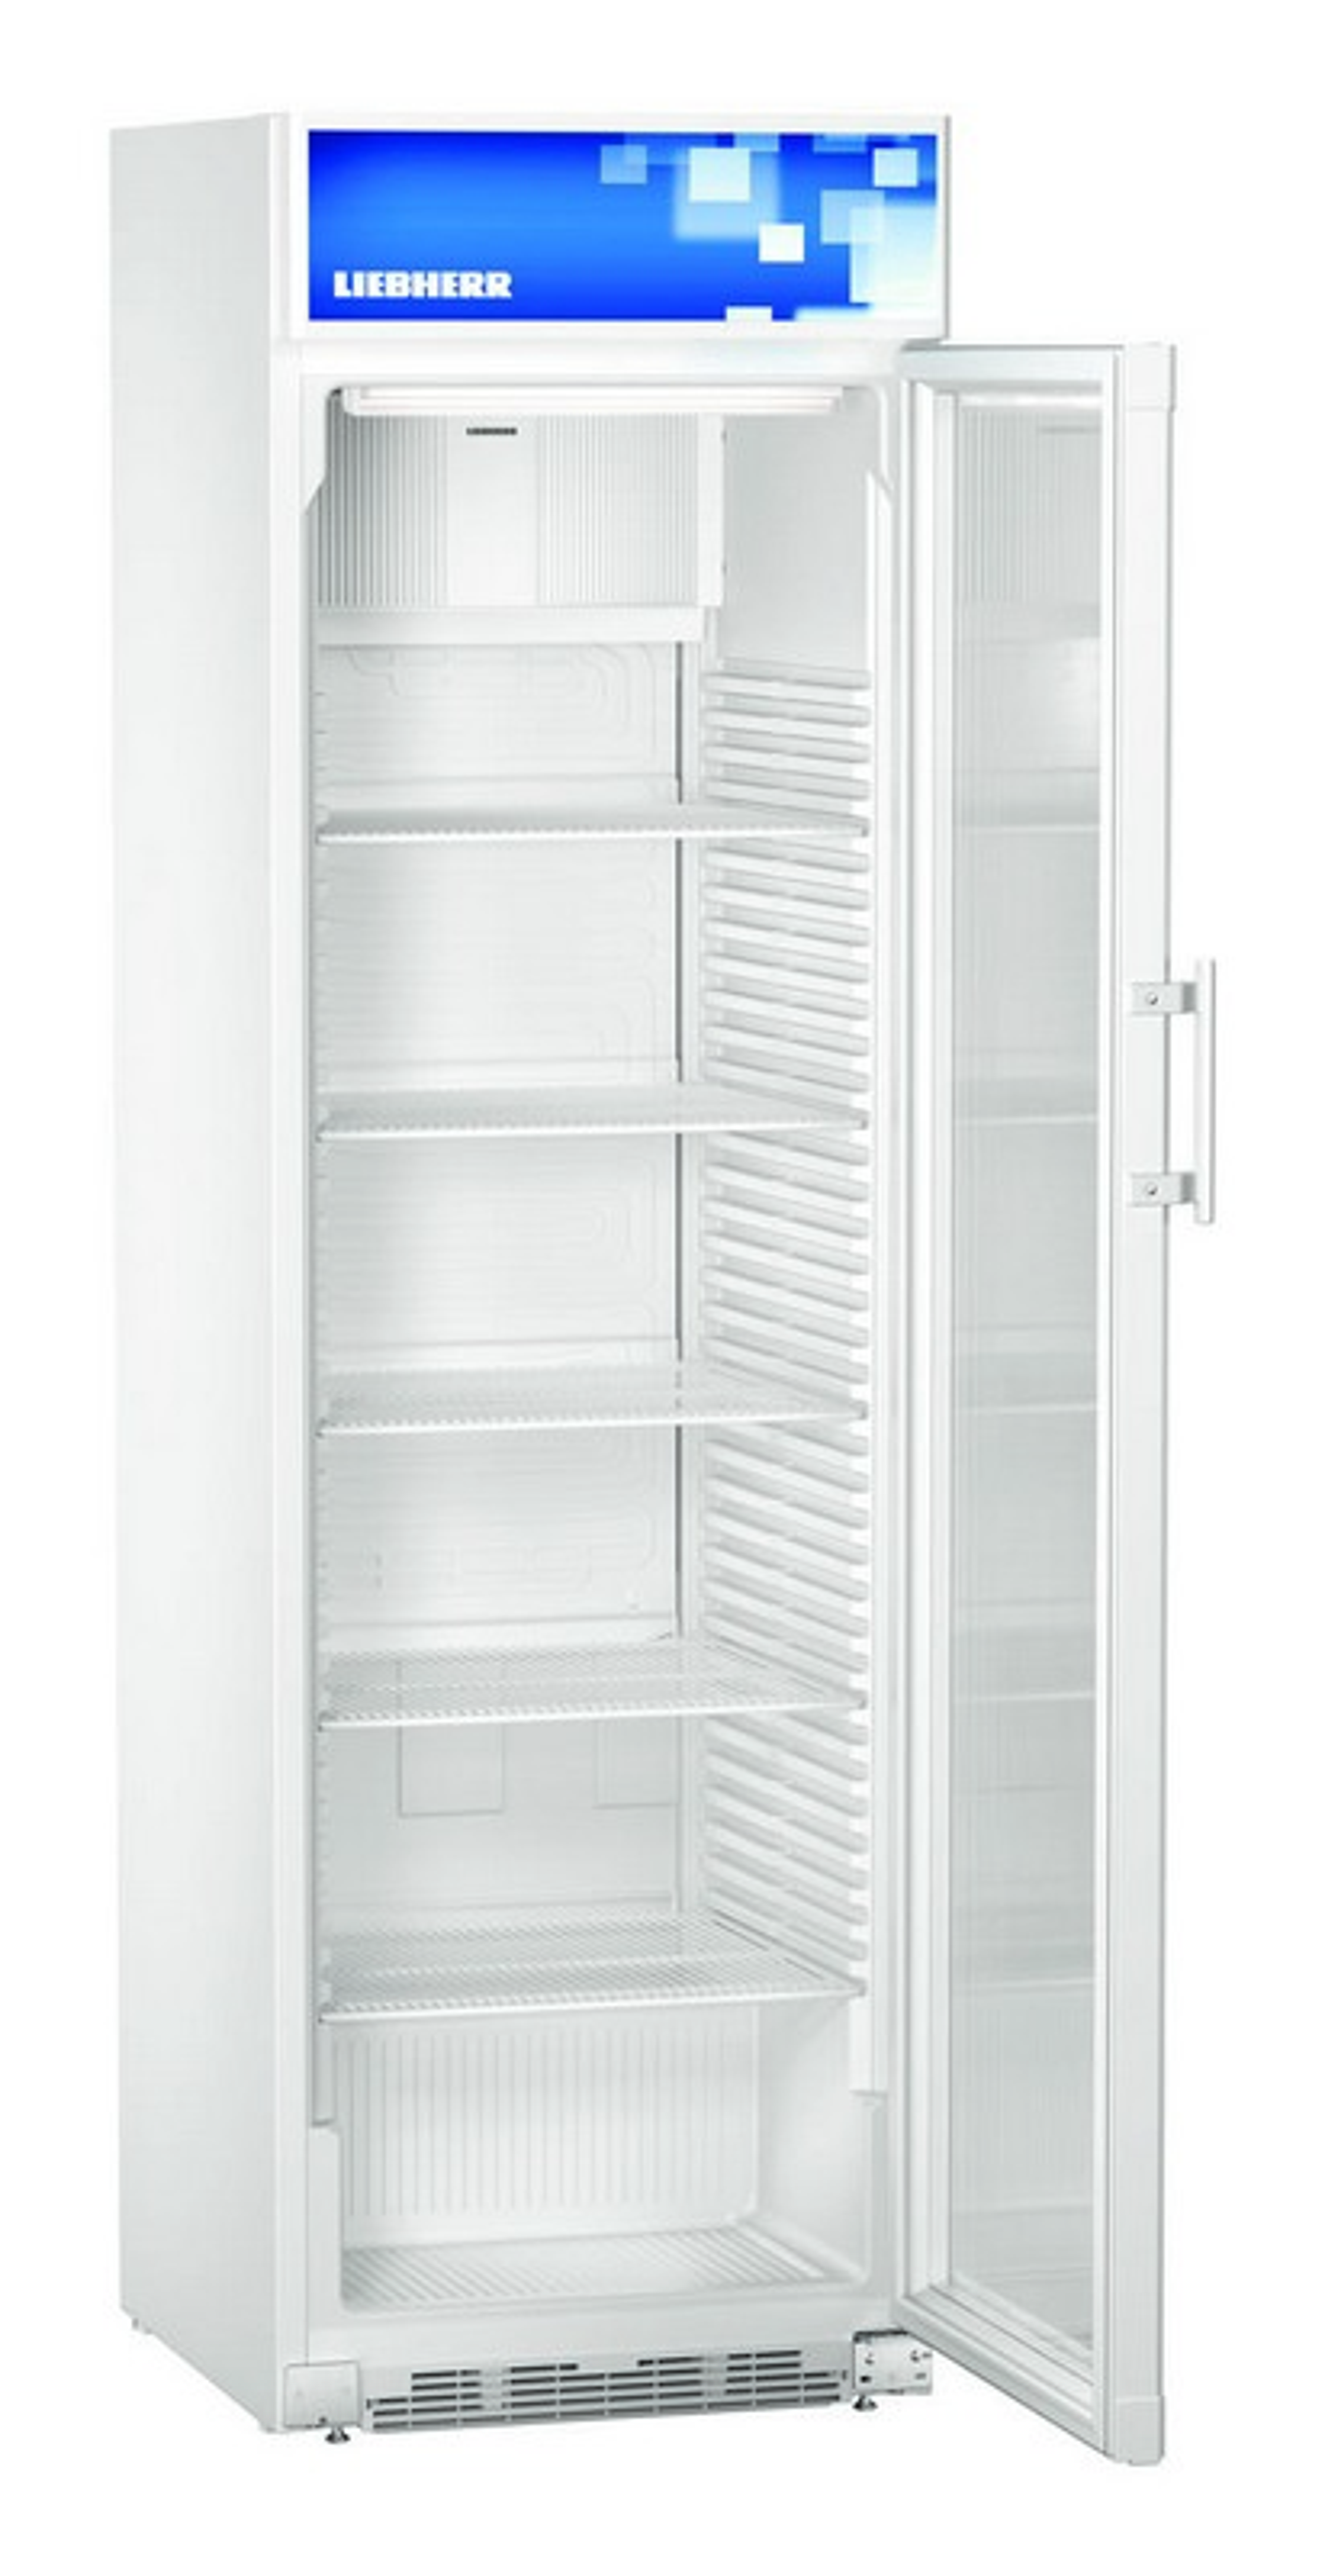 FKDv 4203